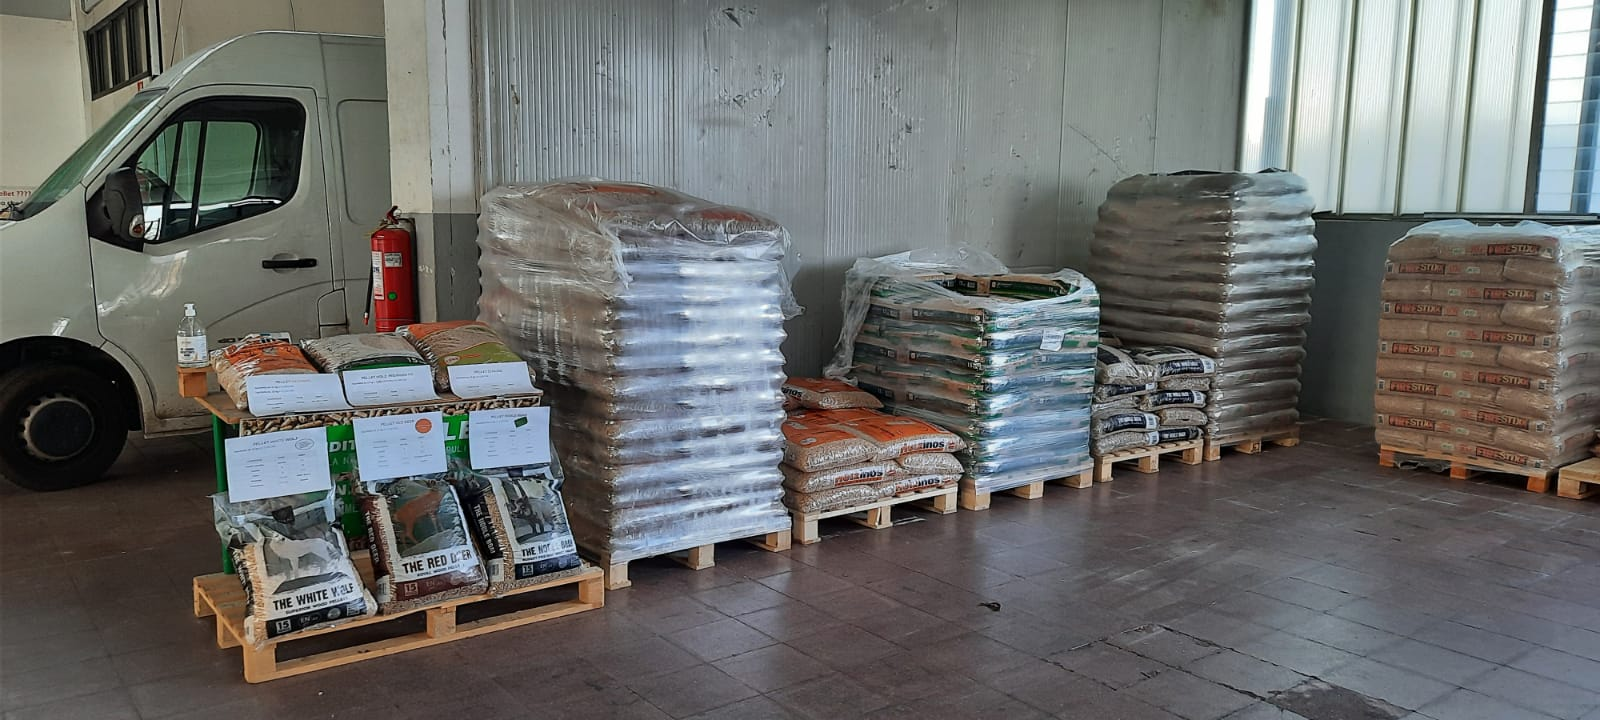 consegna pellet a domicilio novara